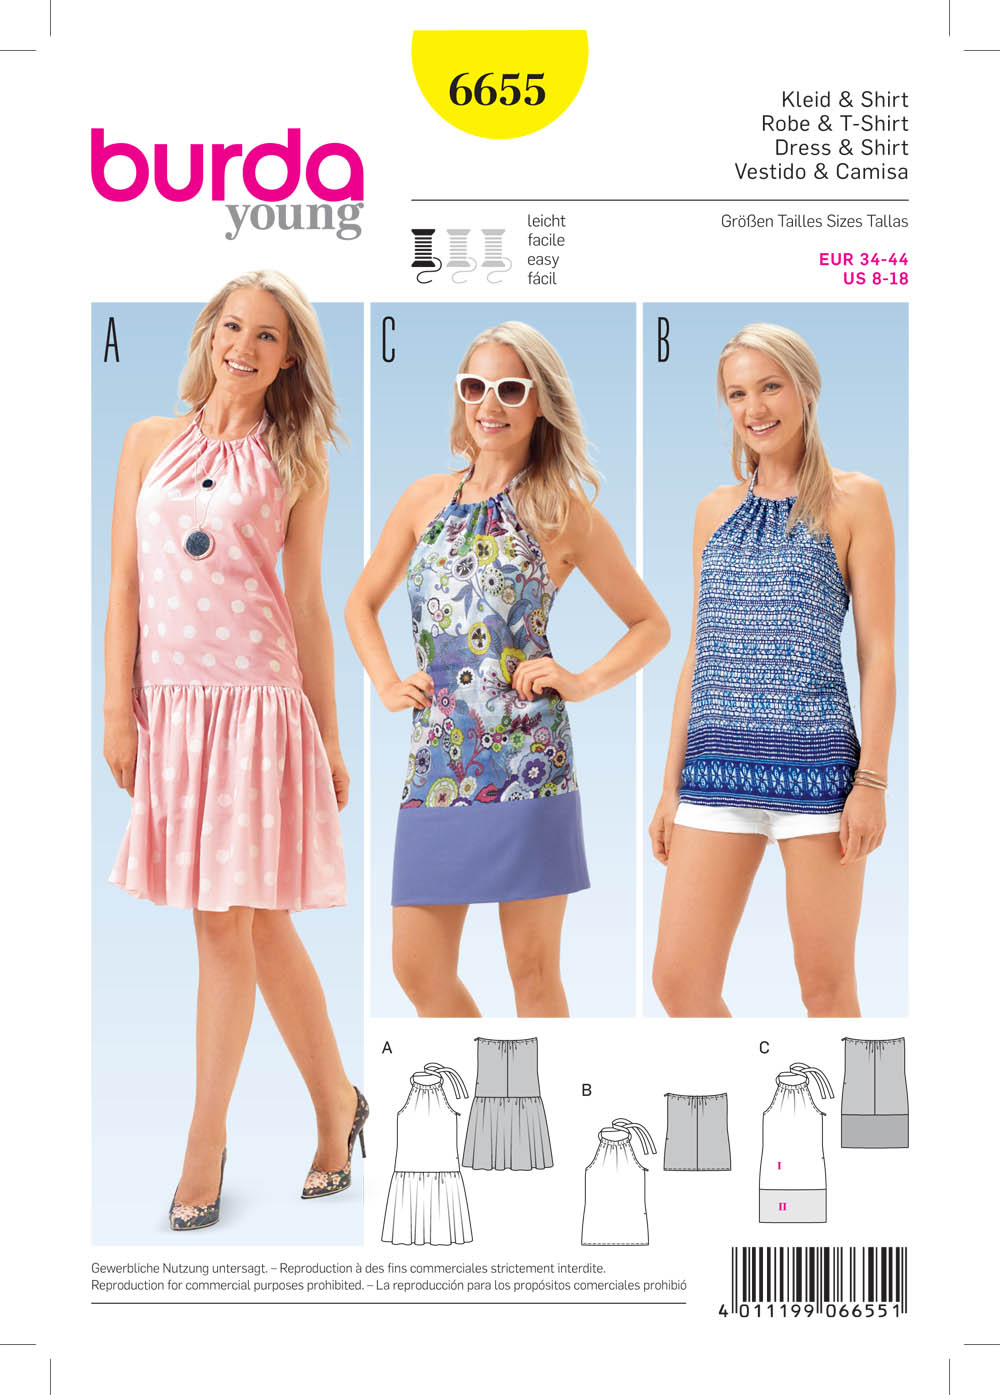 Burda 6655 Misses Dress And Shirt Sewing Pattern